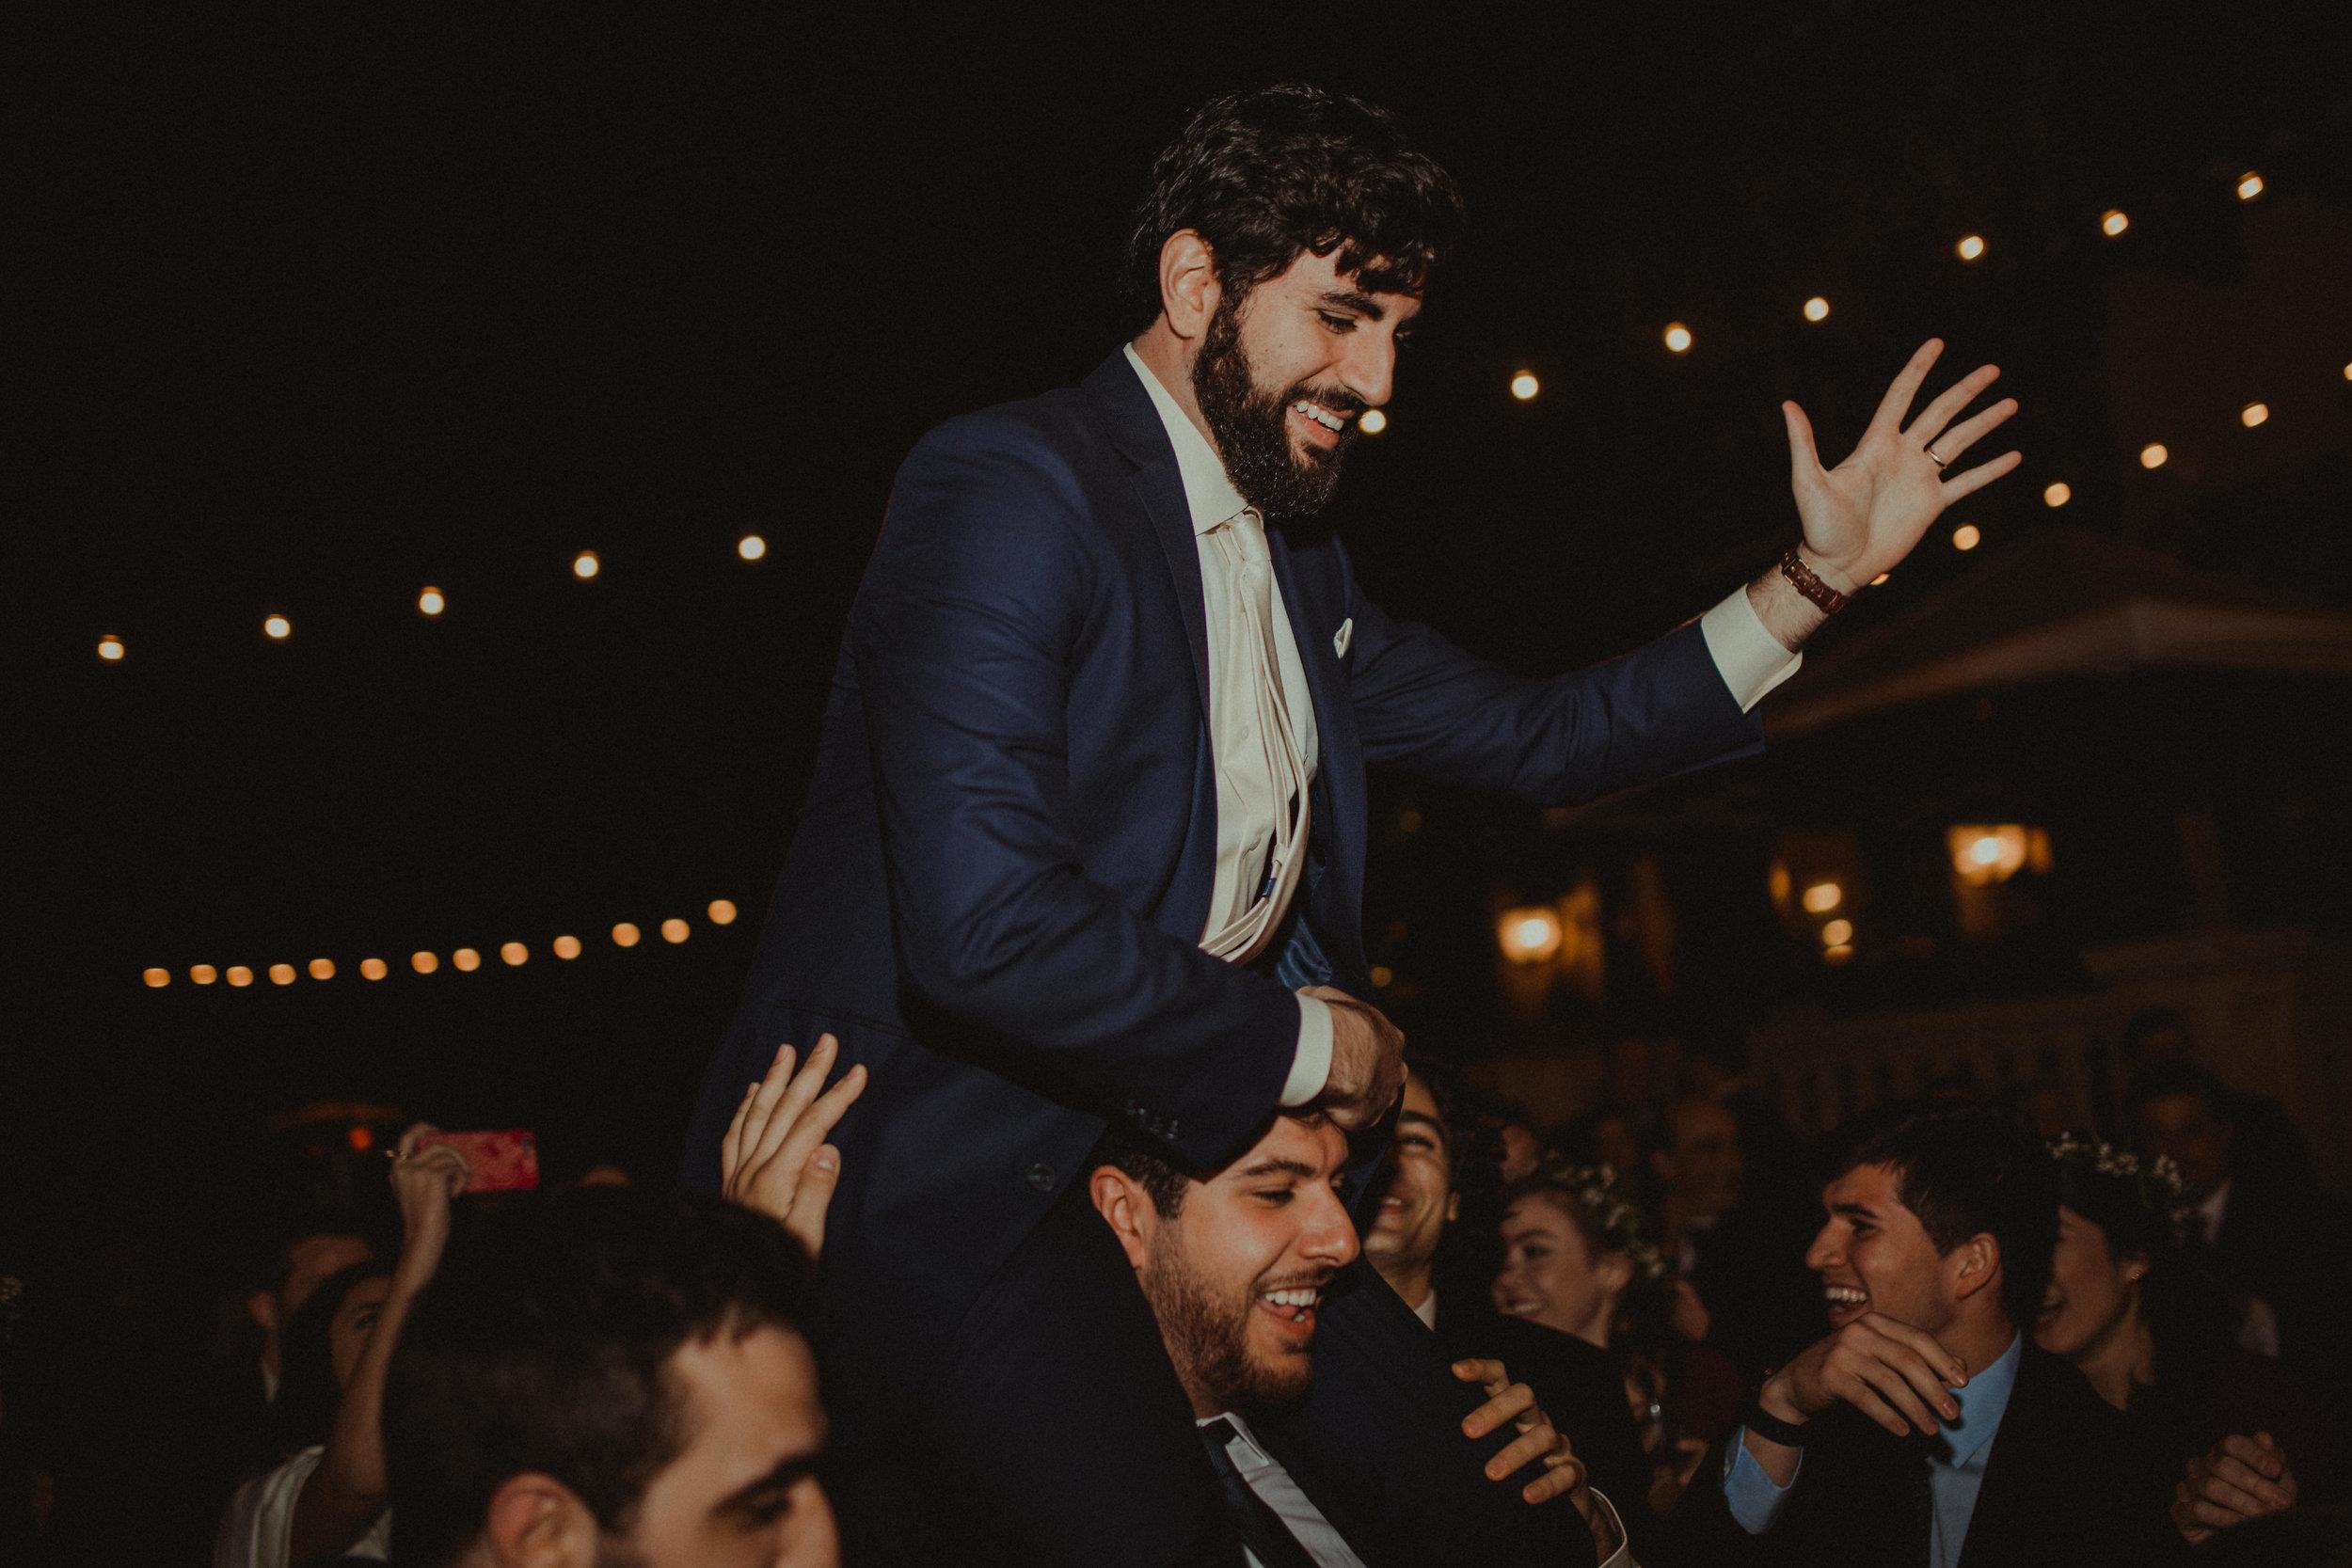 Wedding reception dancing under the market lights